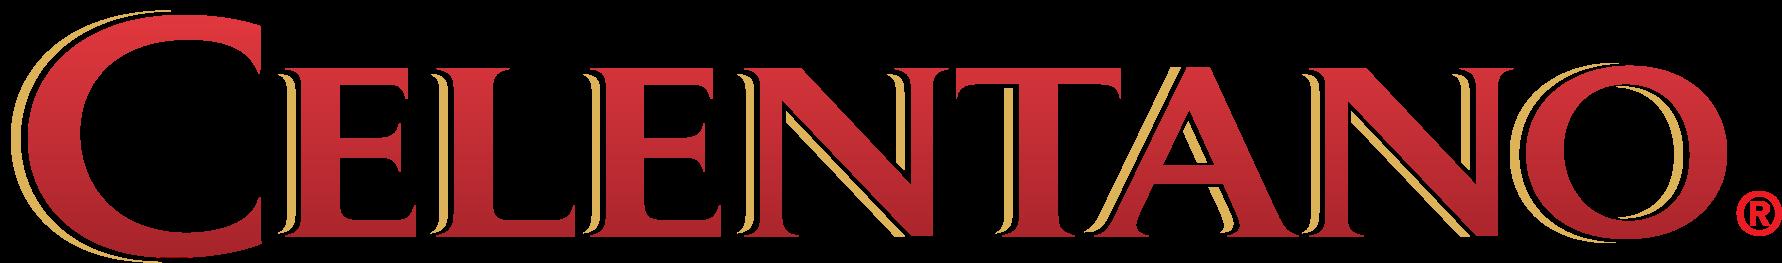 Celentano 2021 logo